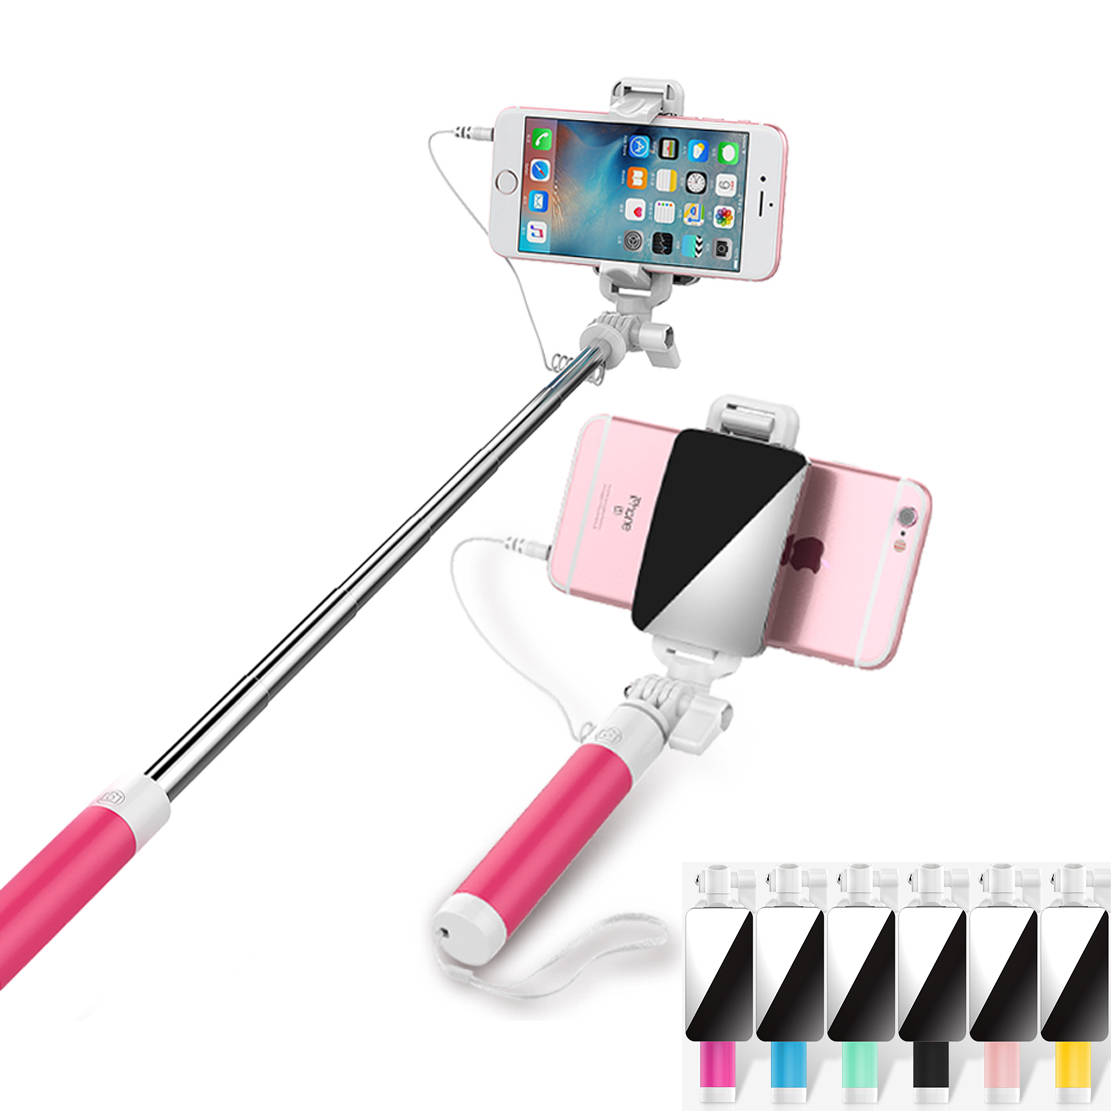 [ no Battery App] Tripod Monopod Selfie Stick selfi palo for ASUS ZenFone Go ZB552KL Live ZB501KL 3s Max ZC521TL Zoom ZE553KL